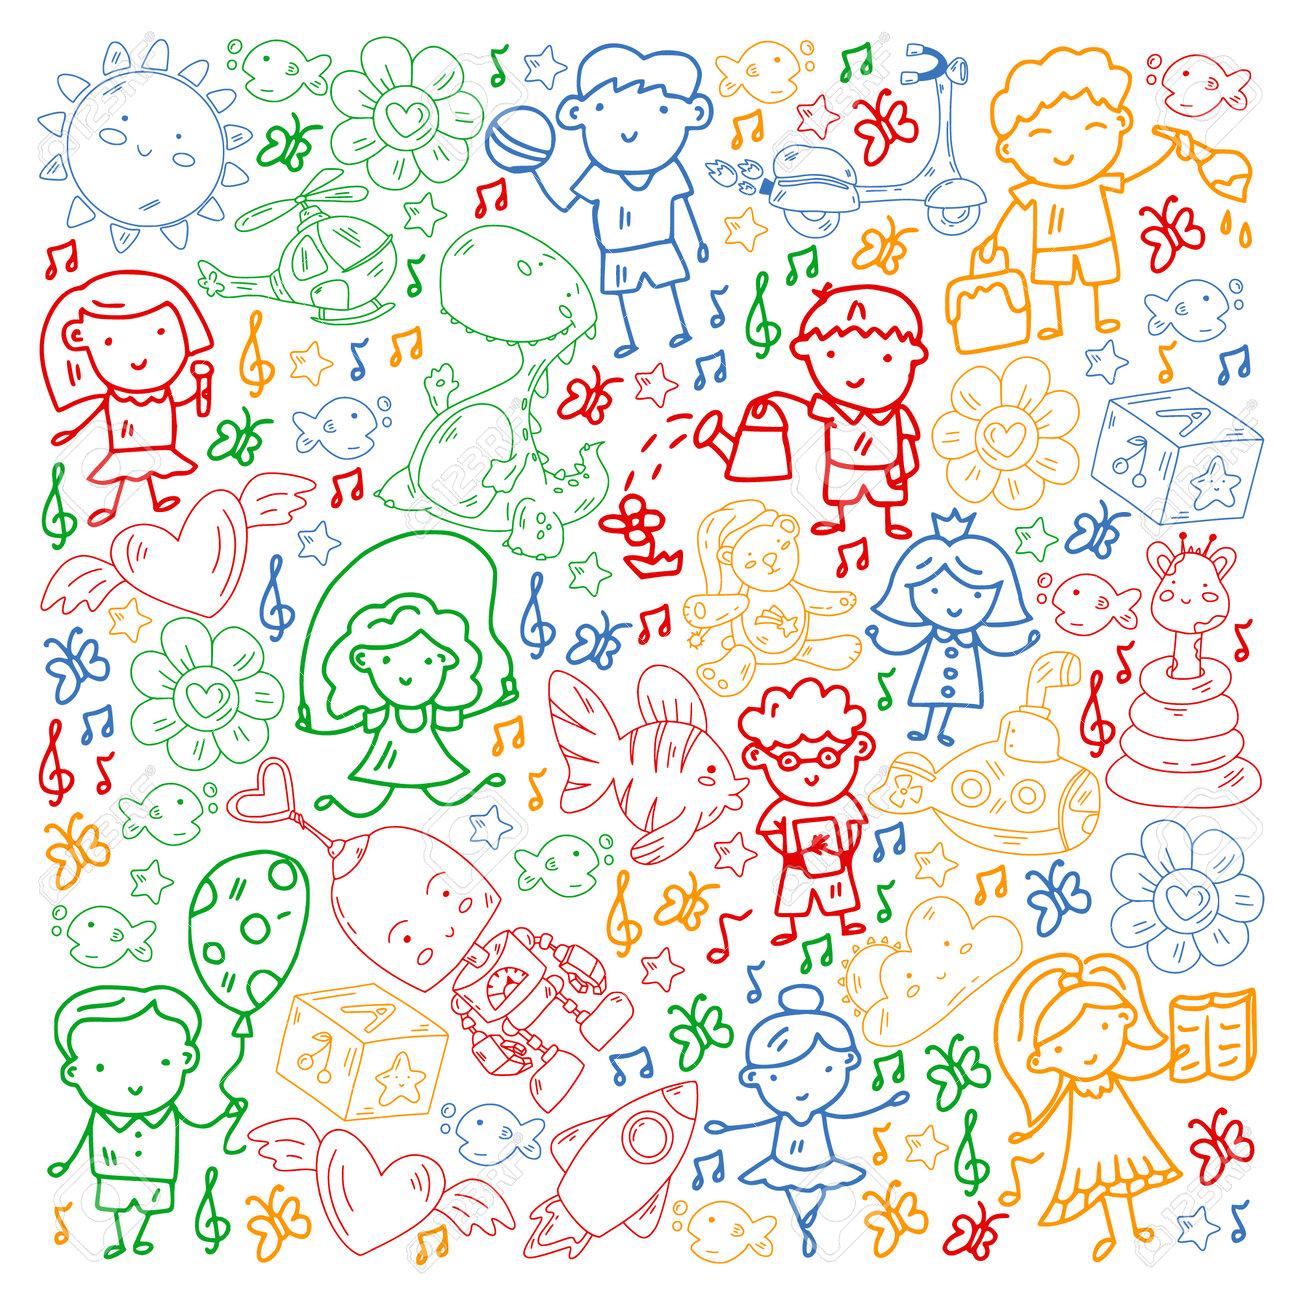 Children play with toys in the kindergarten. Kids playground. Education, creativity, imagination. - 173370400